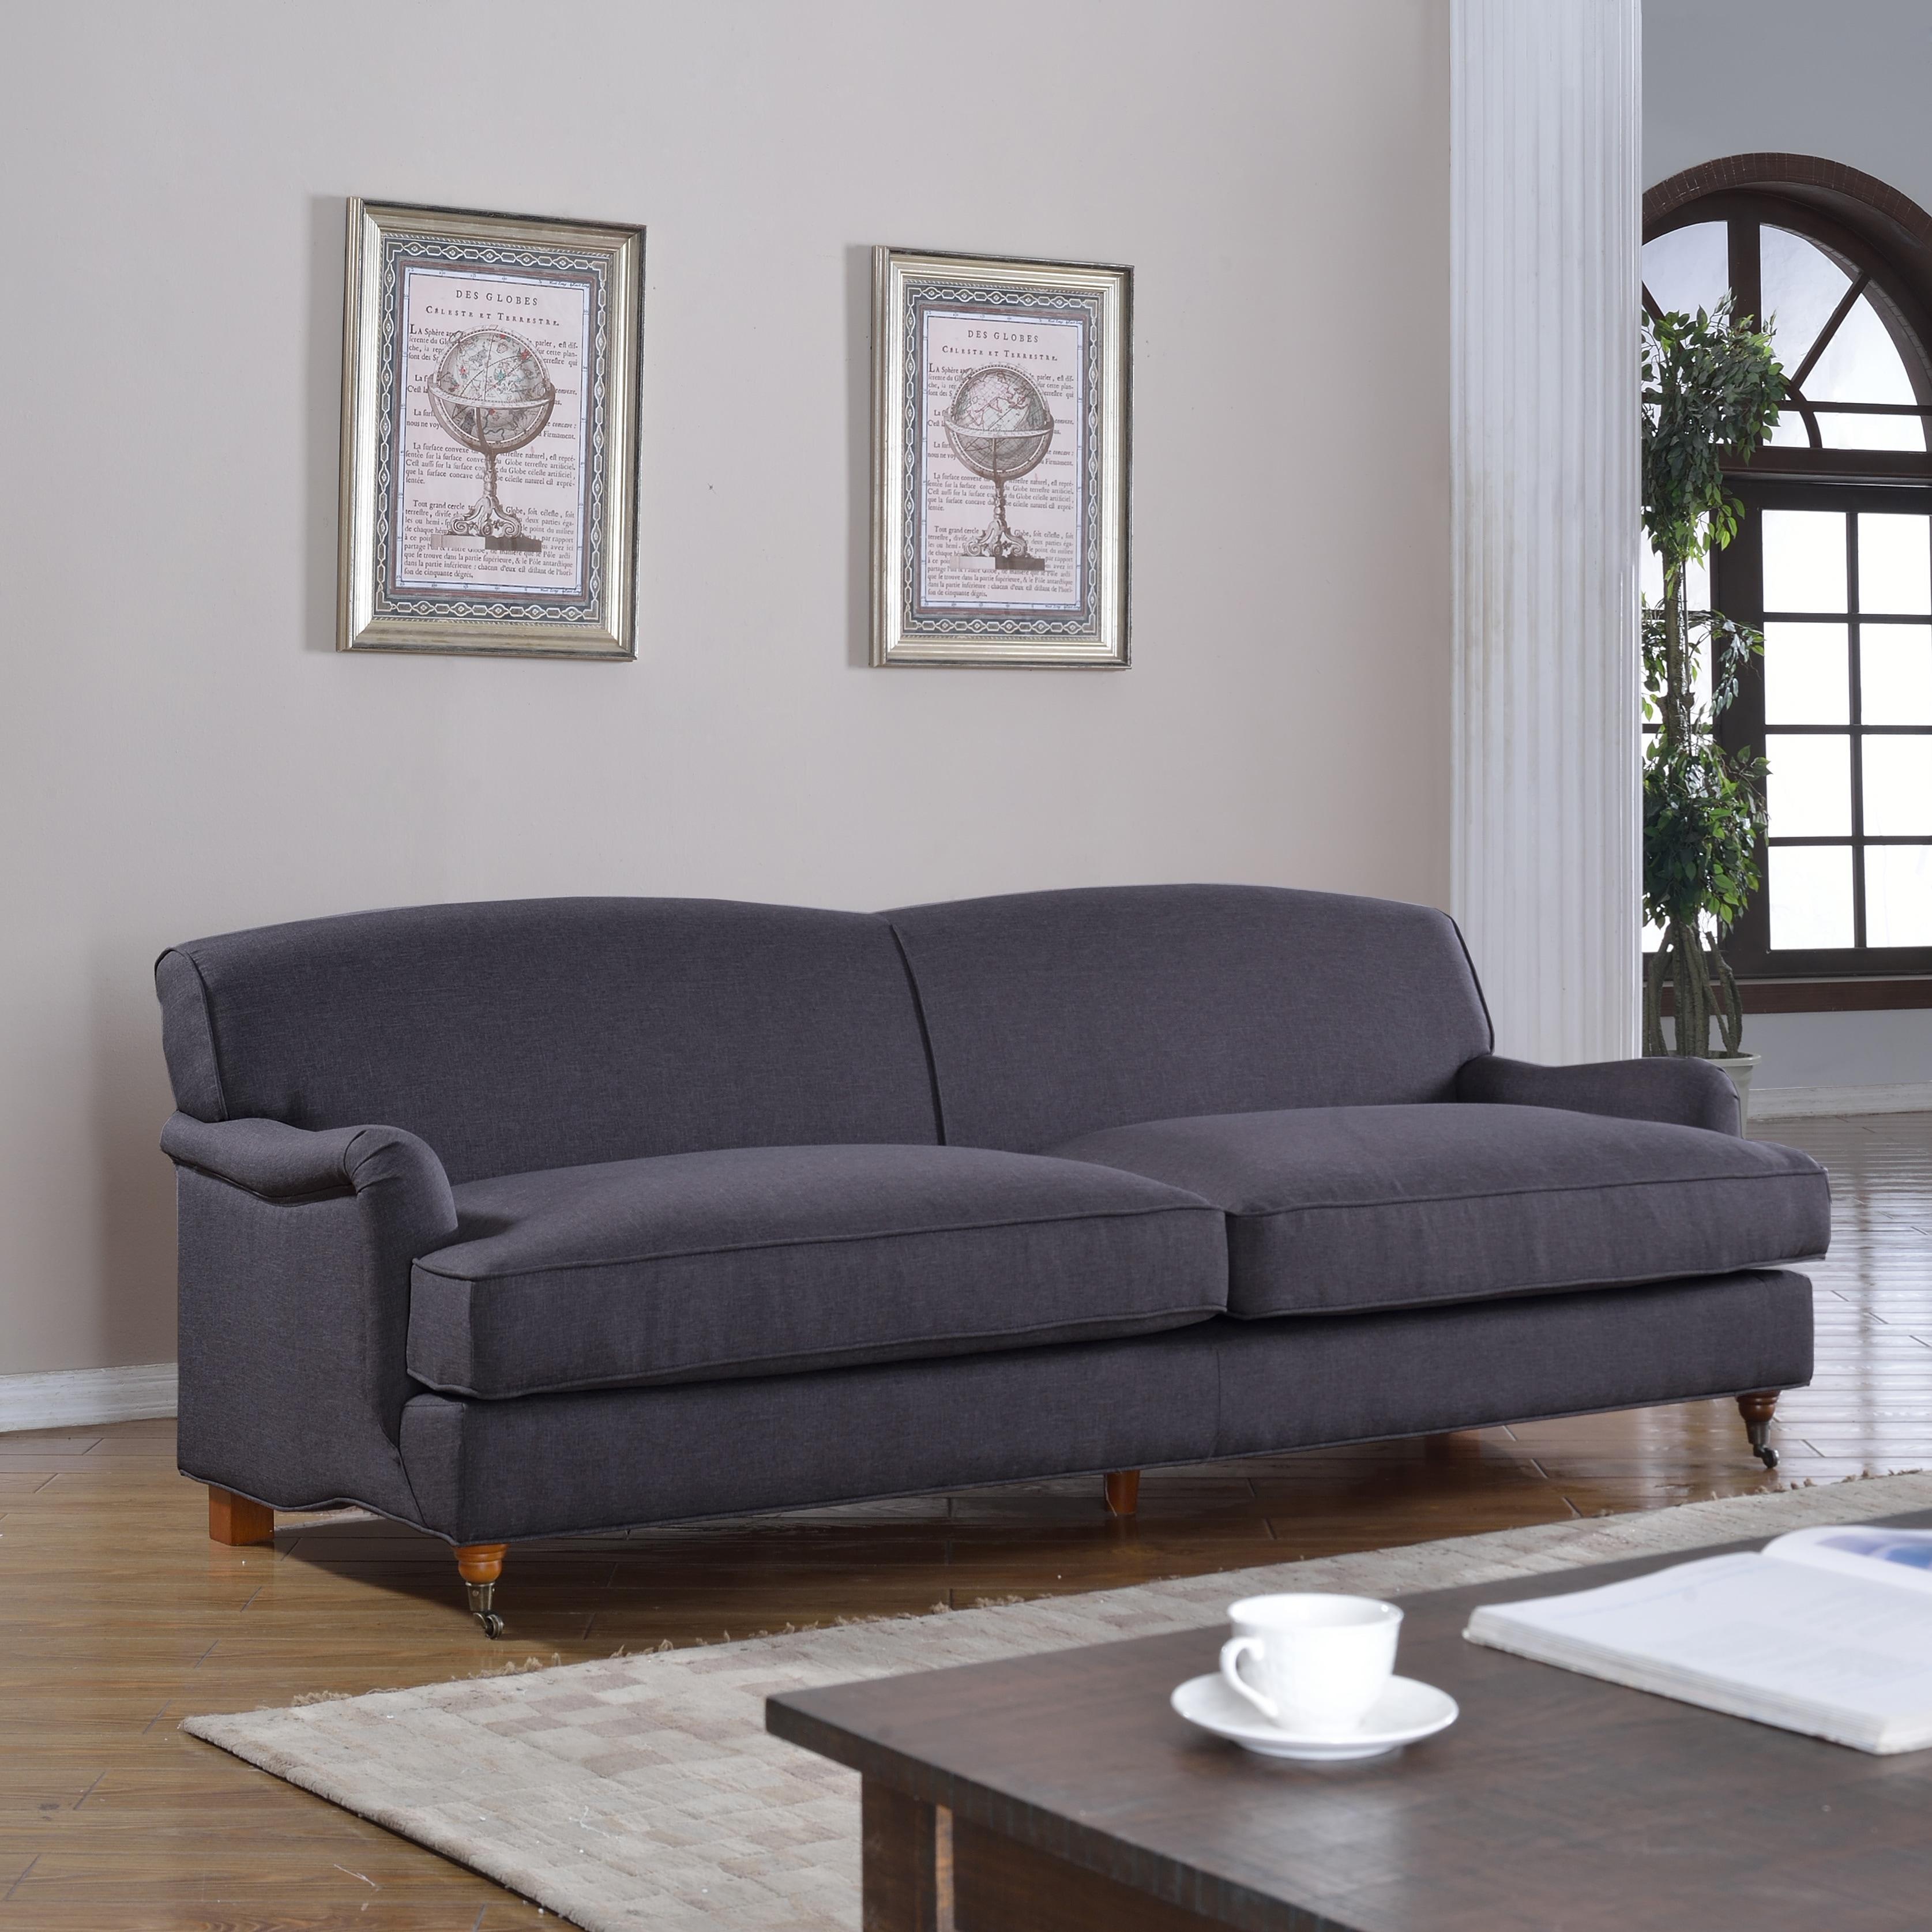 Shop Mid Century Grey Modern Sophisticated Large Linen Fabric Sofa ...